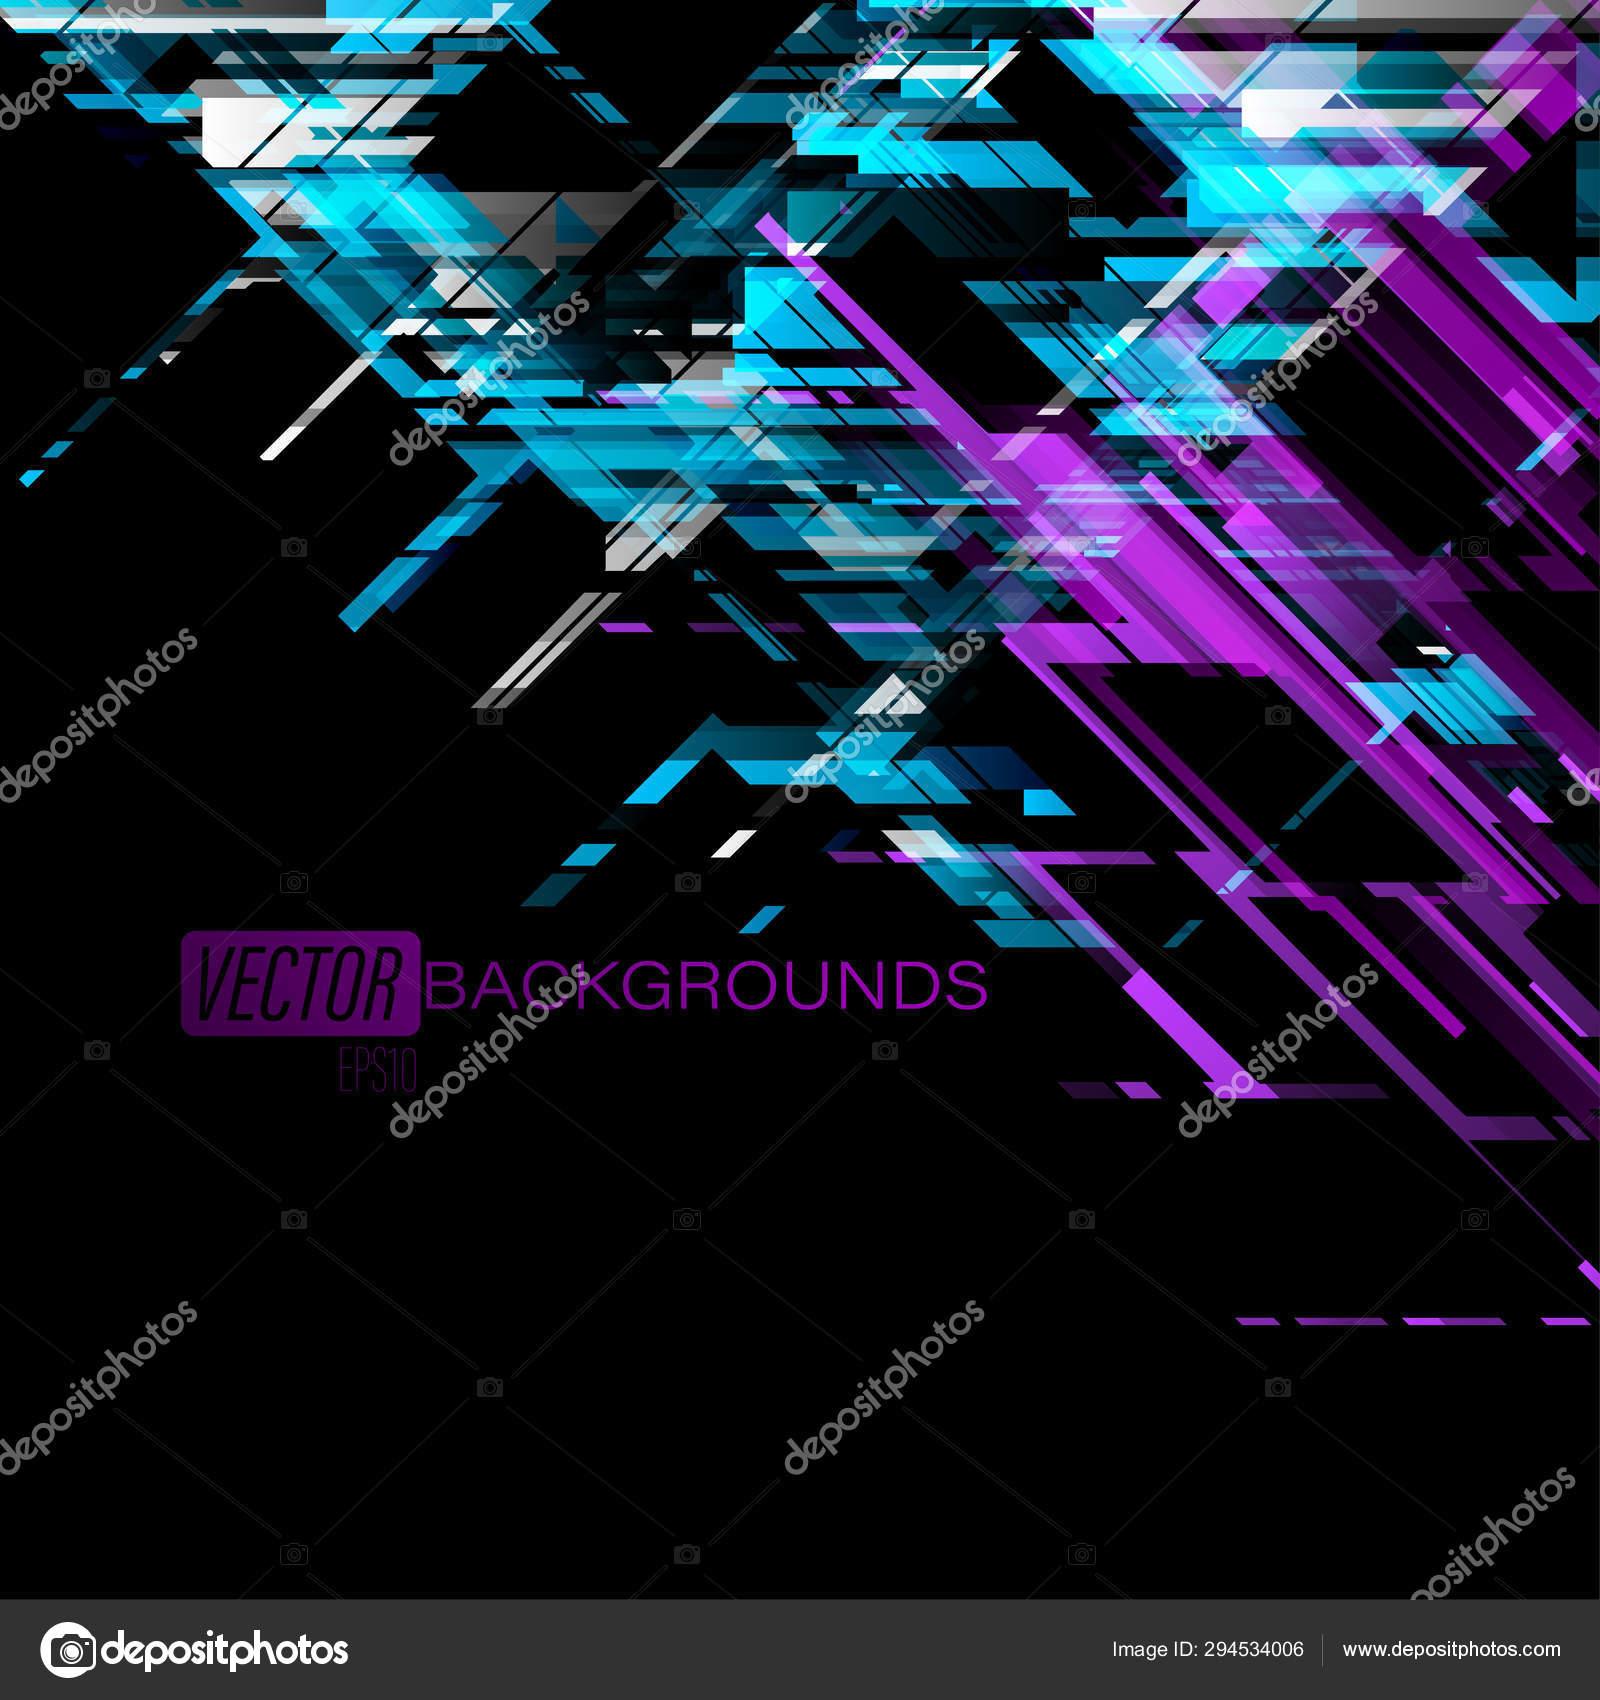 Abstract Blue Purple Geometric Shapes Black Scene Vector Graphics